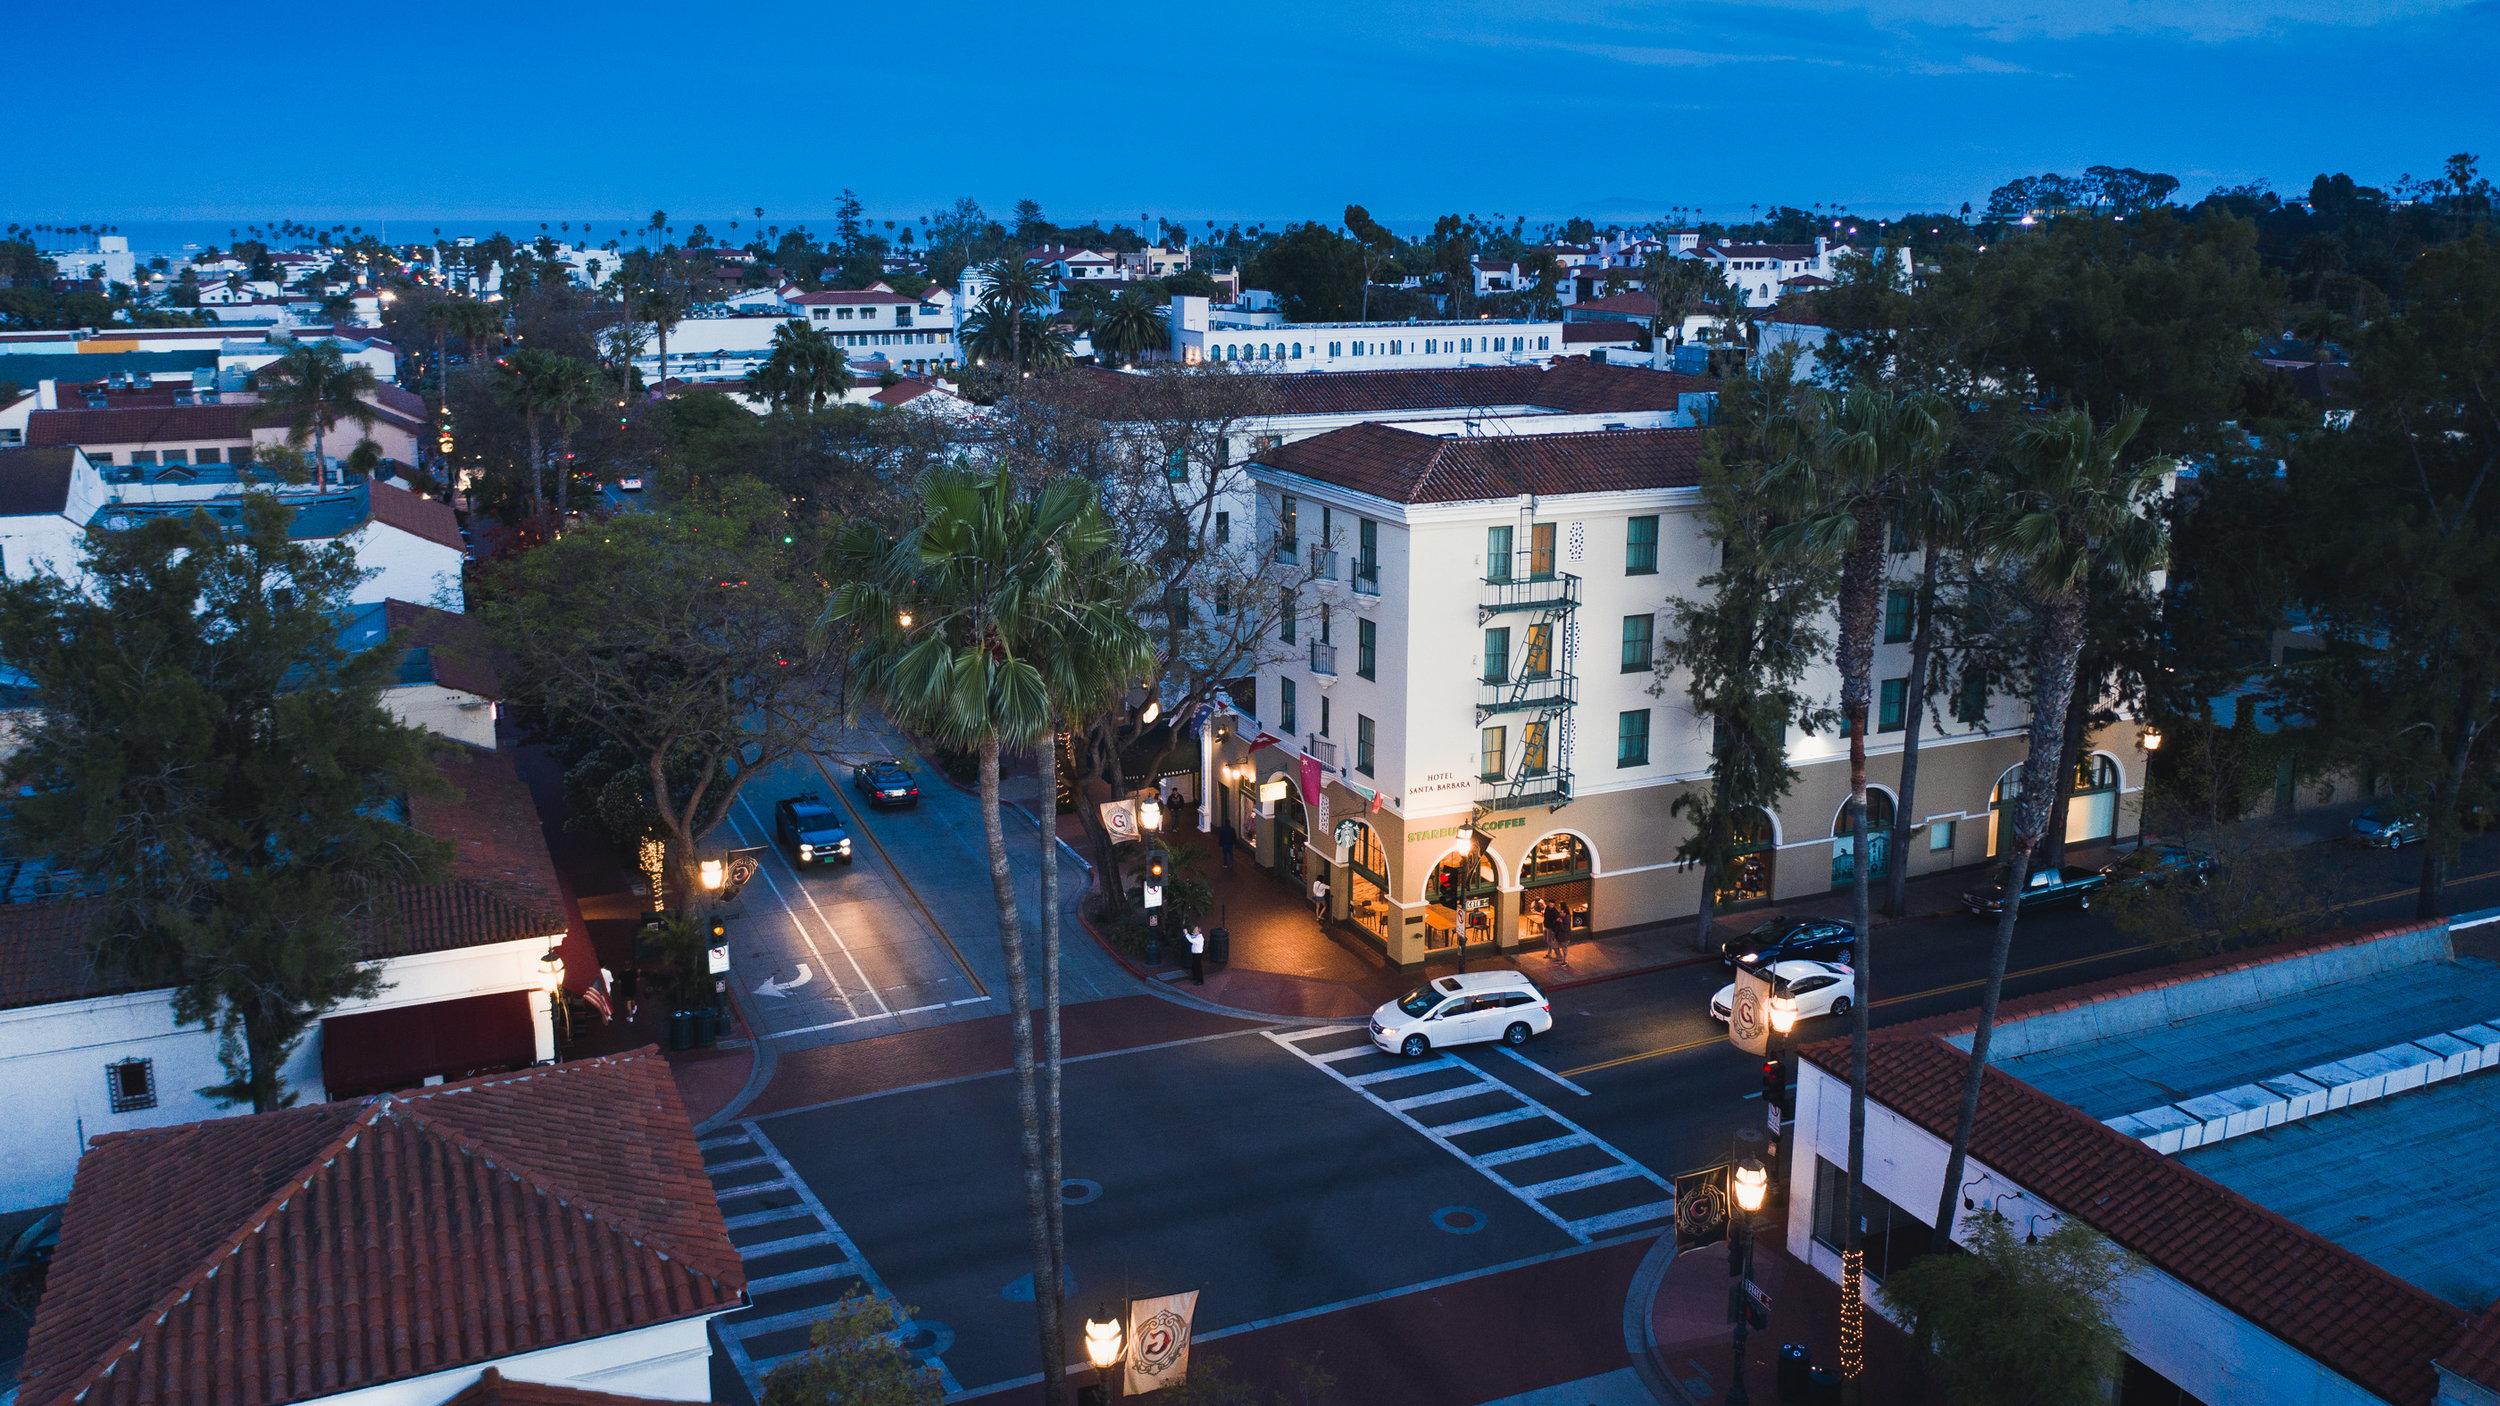 California-Hotel-Hospitality-Photographer-0112.jpg